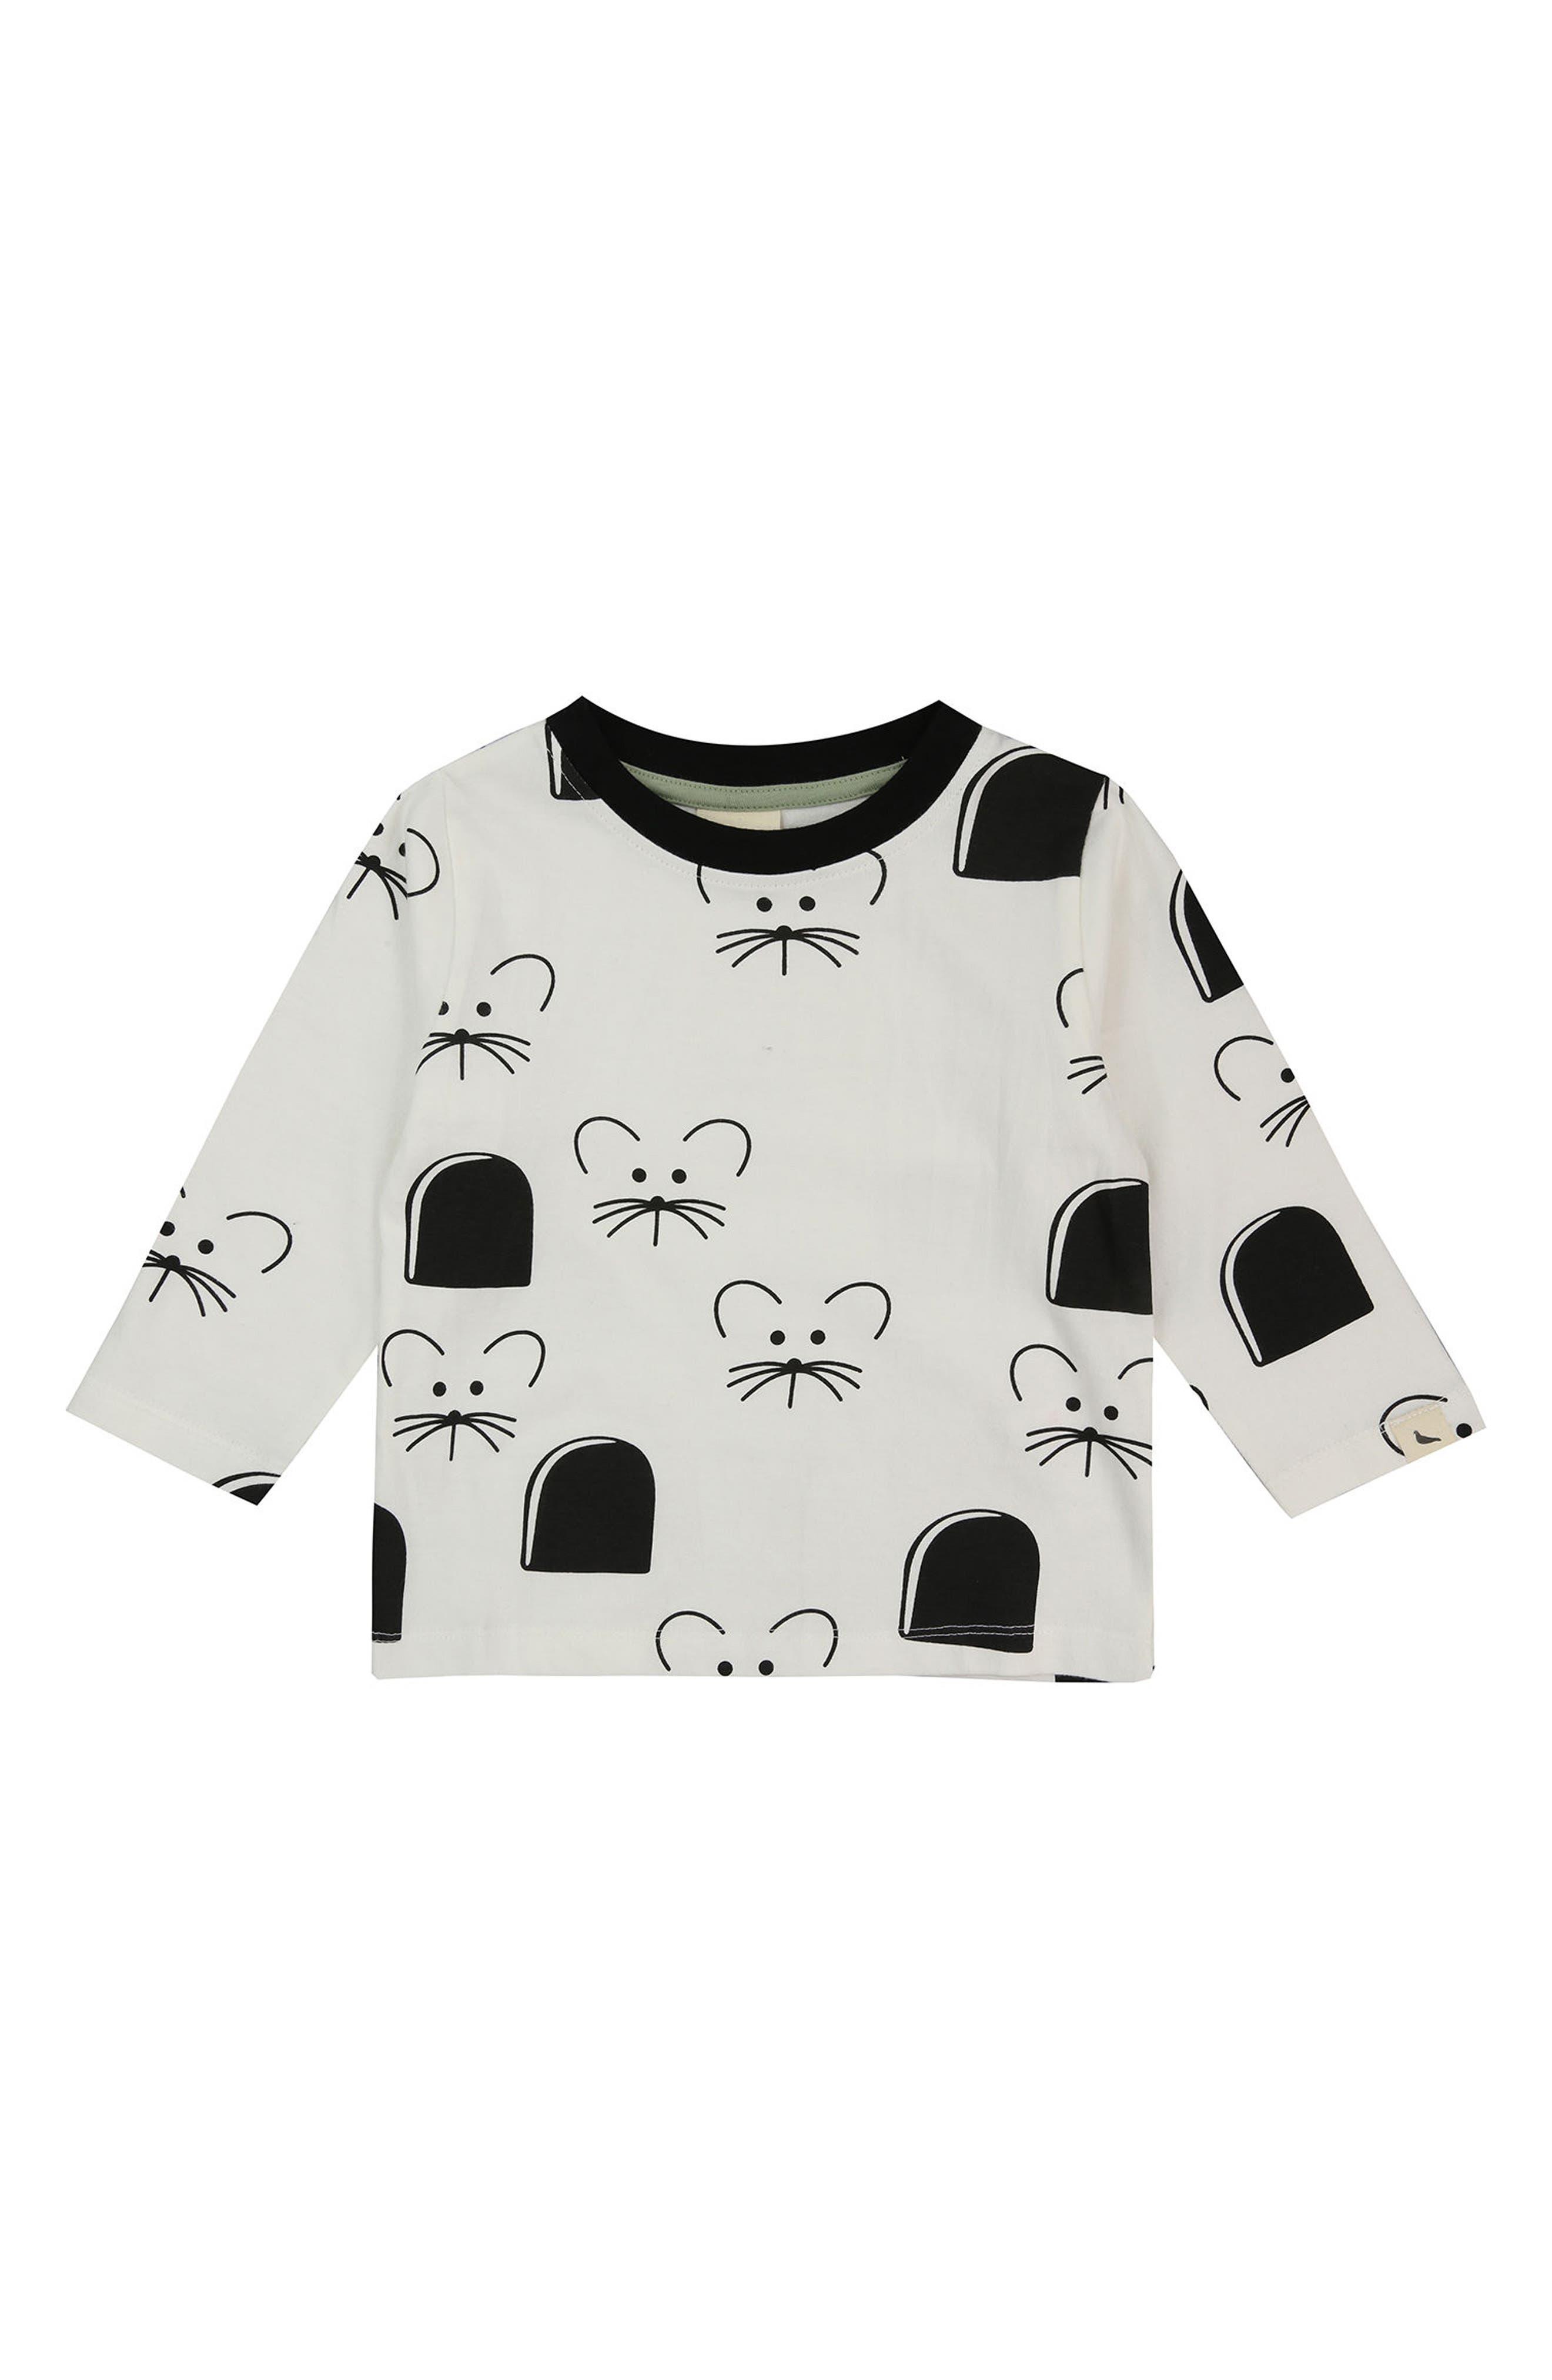 Mouse House Organic Cotton Shirt,                             Main thumbnail 1, color,                             White